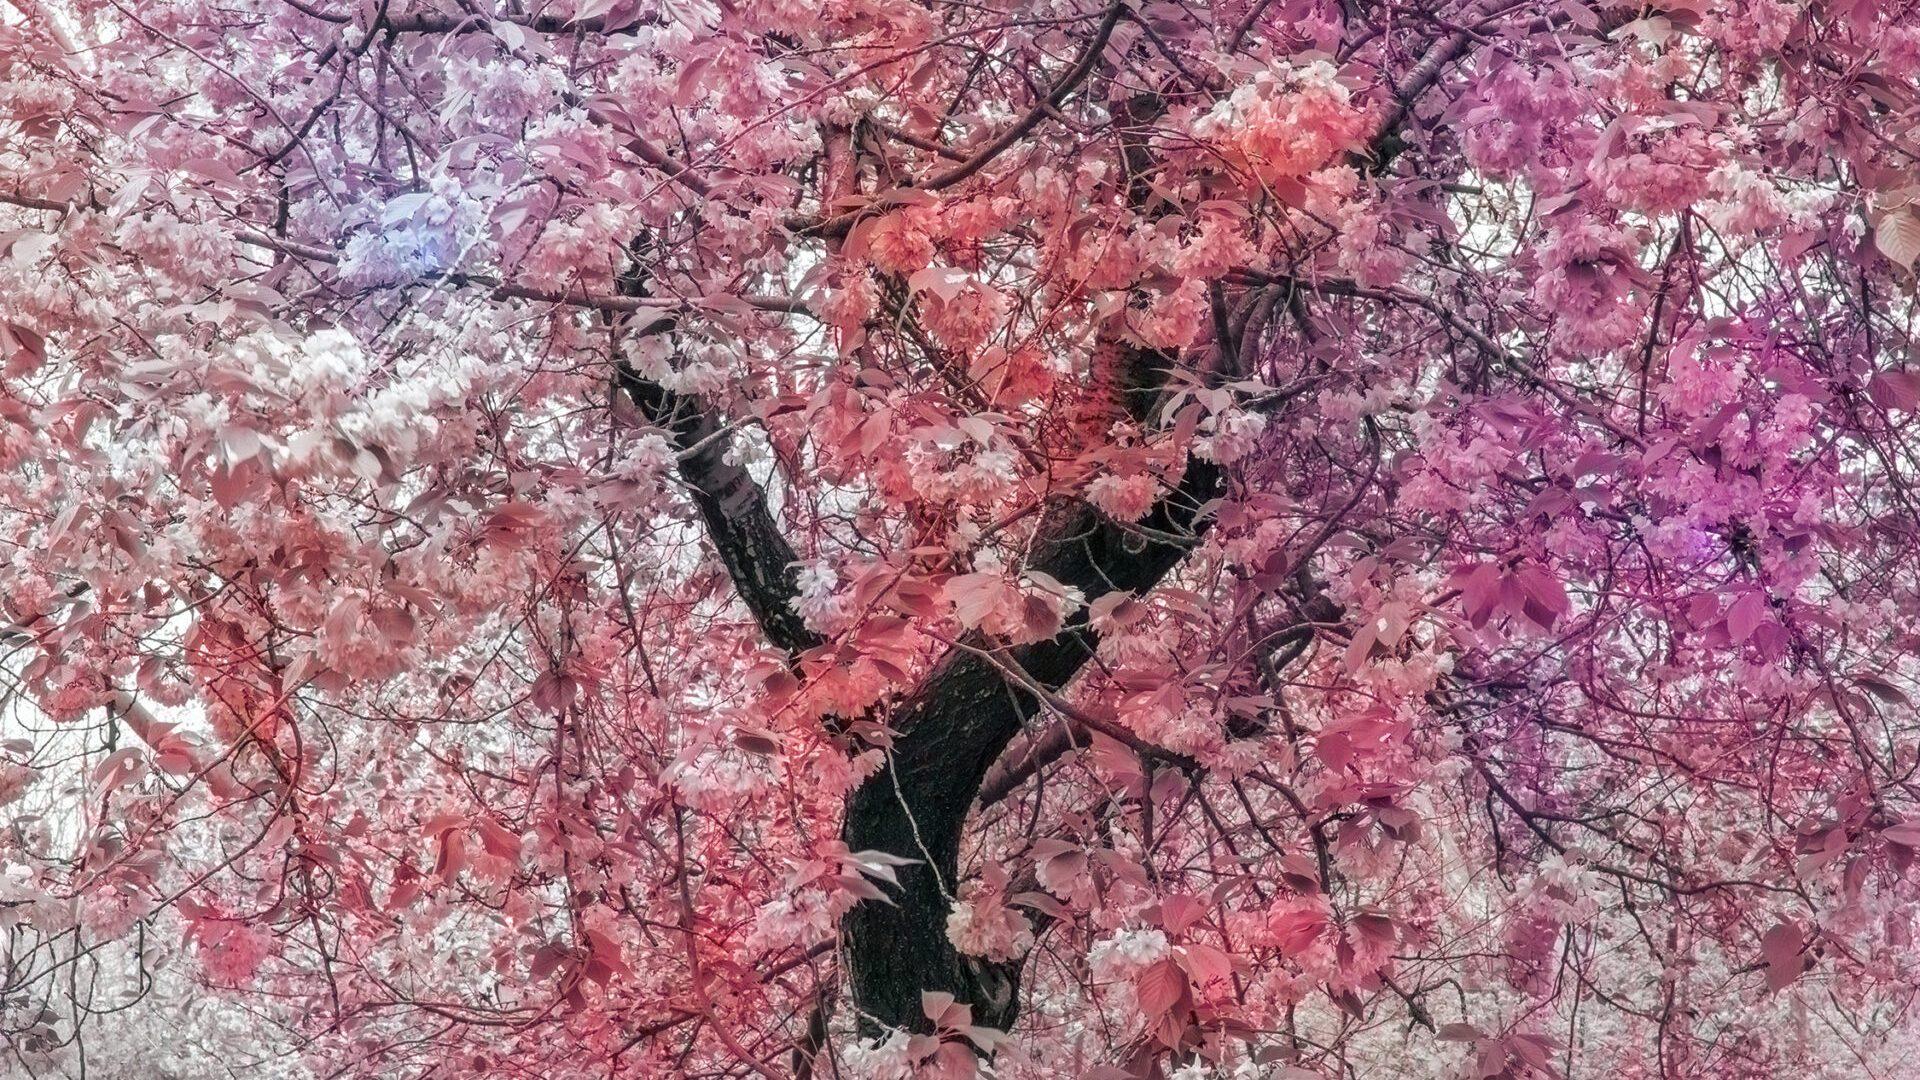 "Trevor Paglen,   Bloom (#a5808a), 2020 dye sublimation print 137.2 cm × 102.9 cm (54"" × 40-1/2""), 2020   Edition 1 of 5,  Edition of 5 + 2 APs,   PHOTO,   No. 75666.01,  Alt # 388,   format of photography: digital,  source of photography: Trevor Paglen Studio"